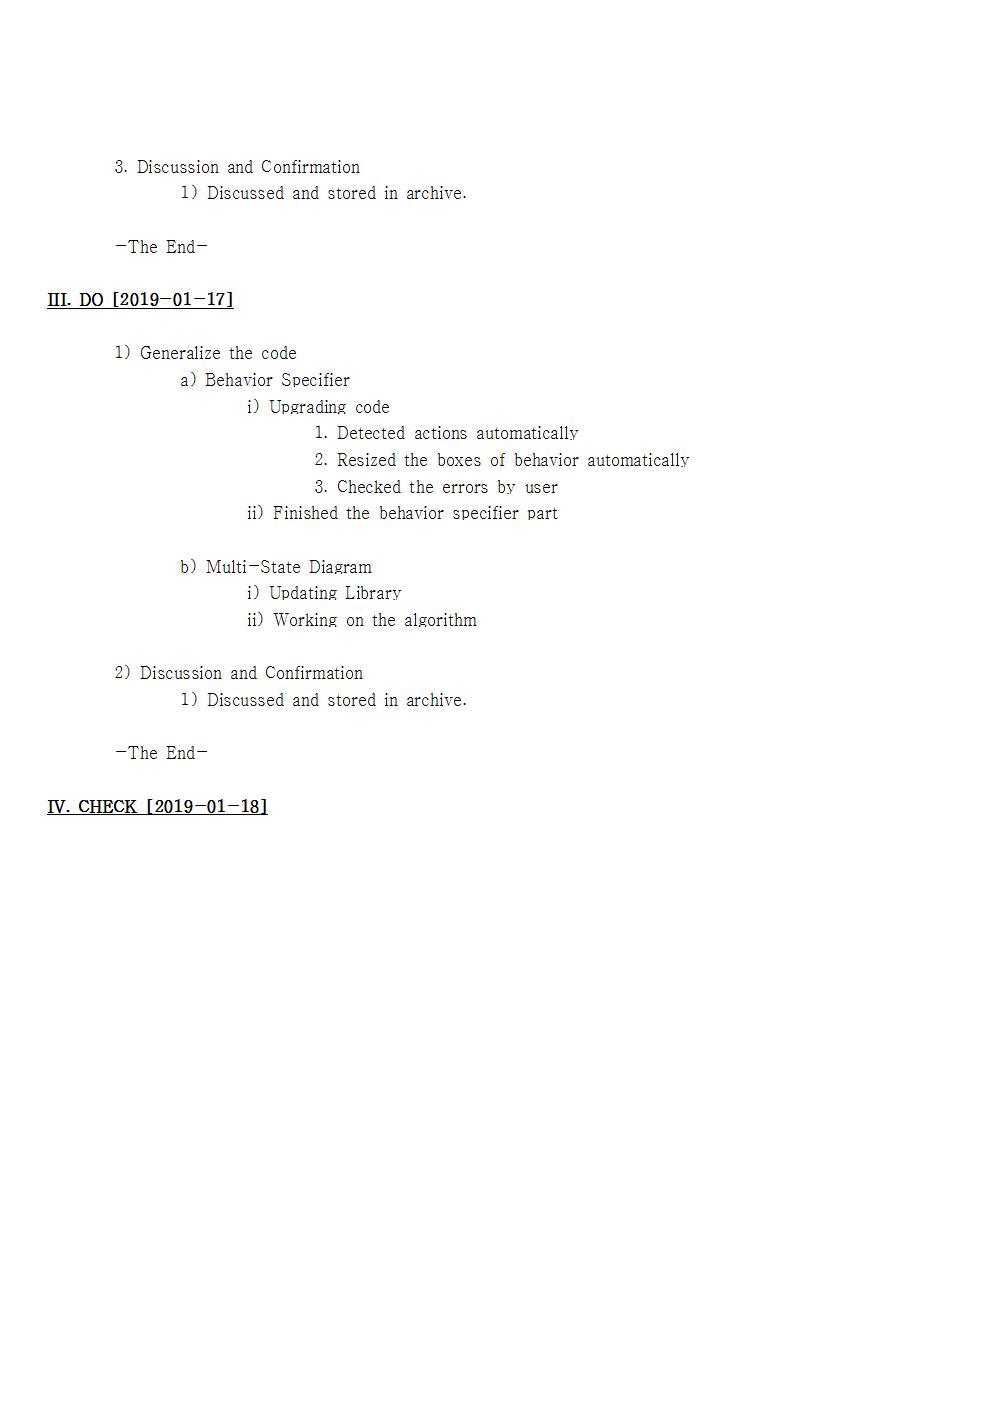 D-[19-002-RD-02]-[PRISM2.0-ADOxx]-[2019-01-17]-[MR]002.jpg